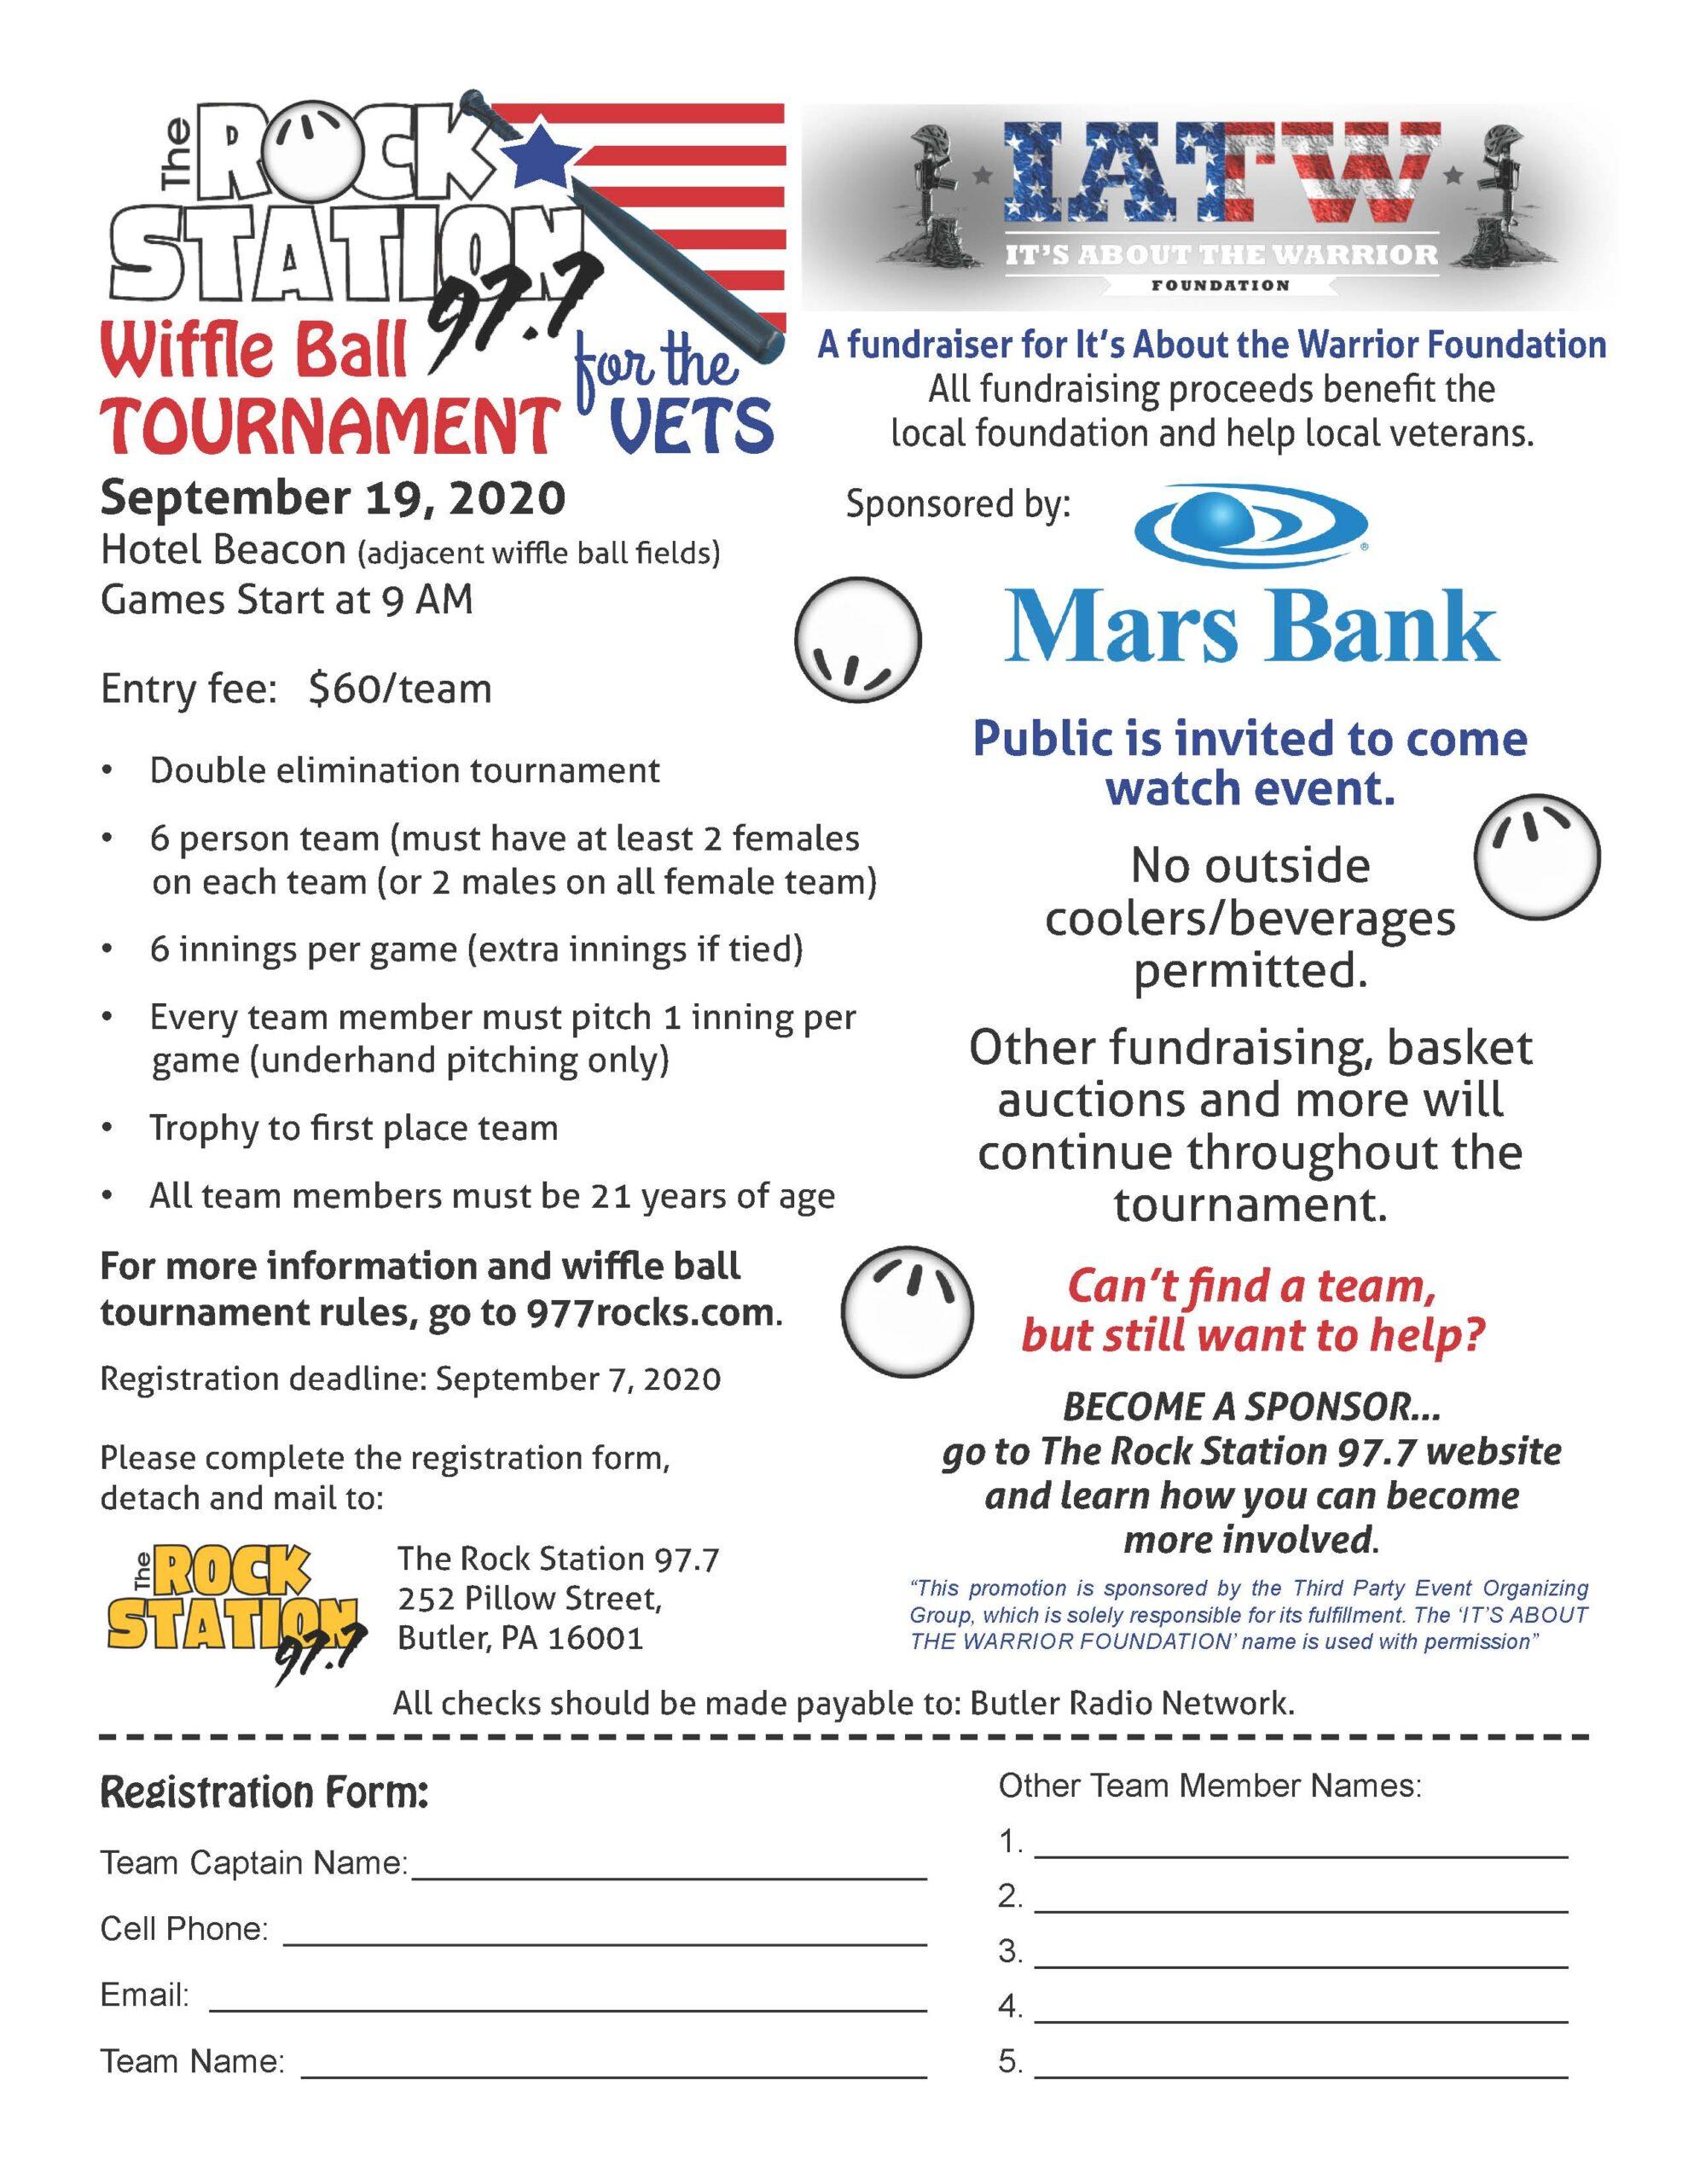 Rock Station Wiffle Ball Tournament reg 2020